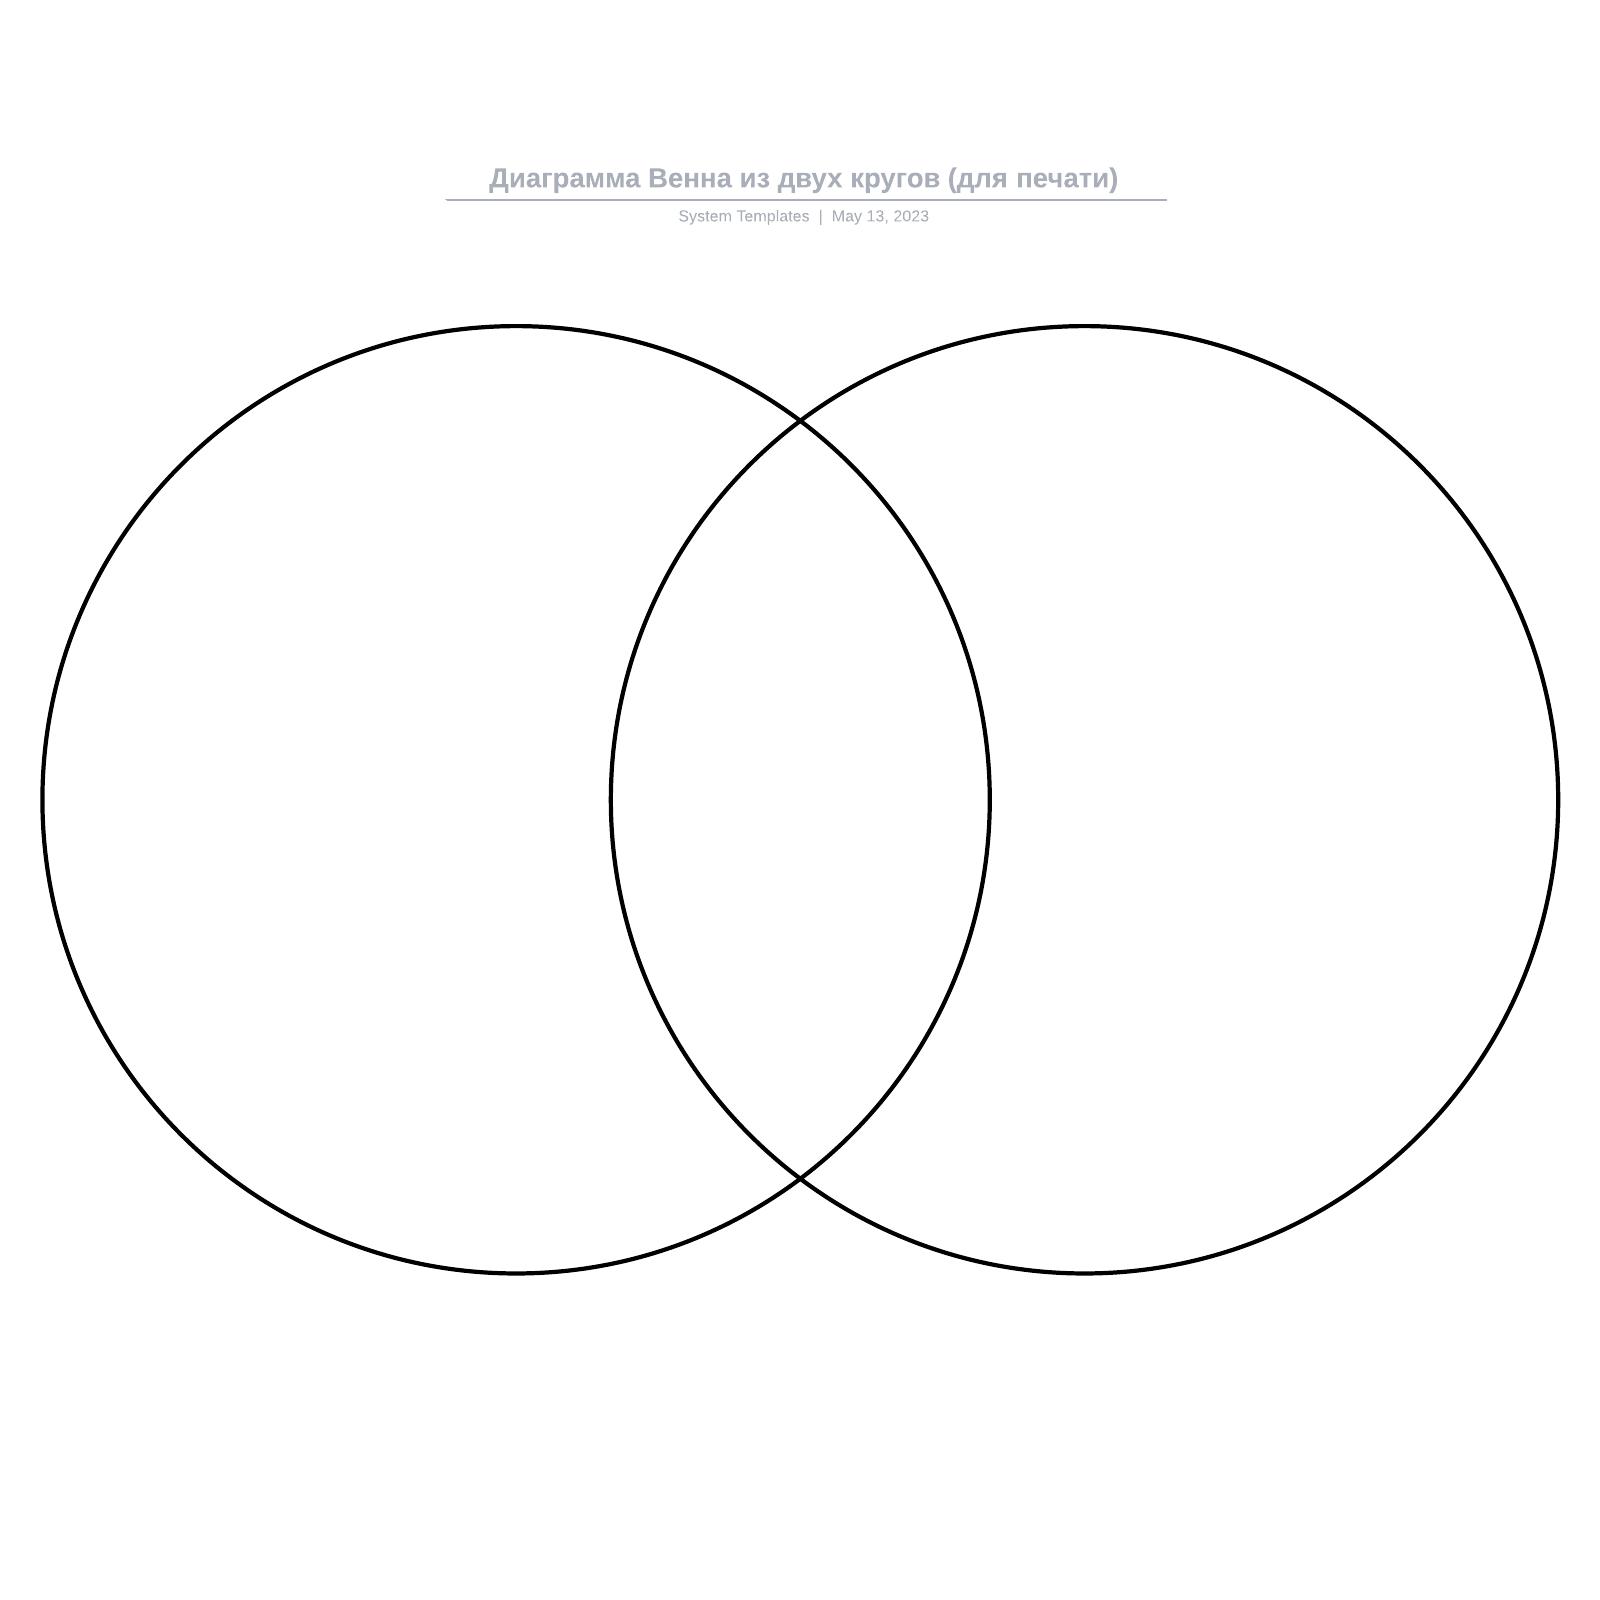 Диаграмма Венна из двух кругов (для печати)